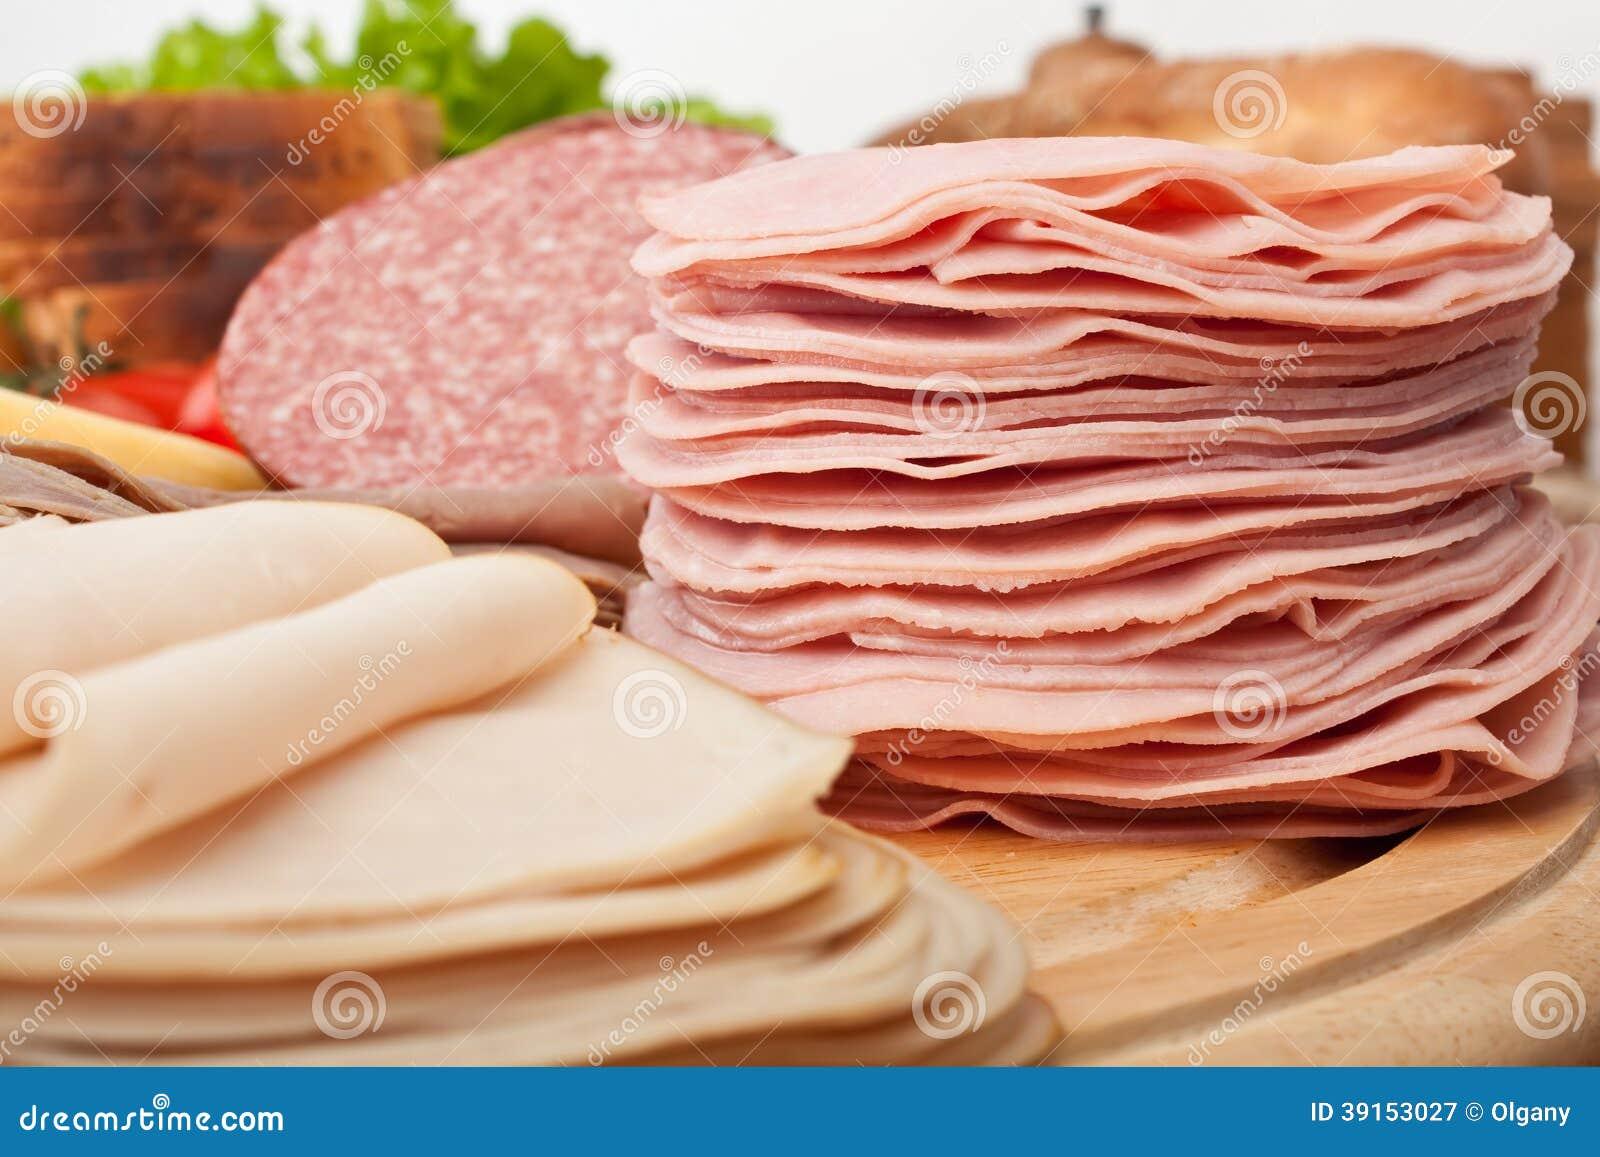 zagonara homeopata bologna meat - photo#11